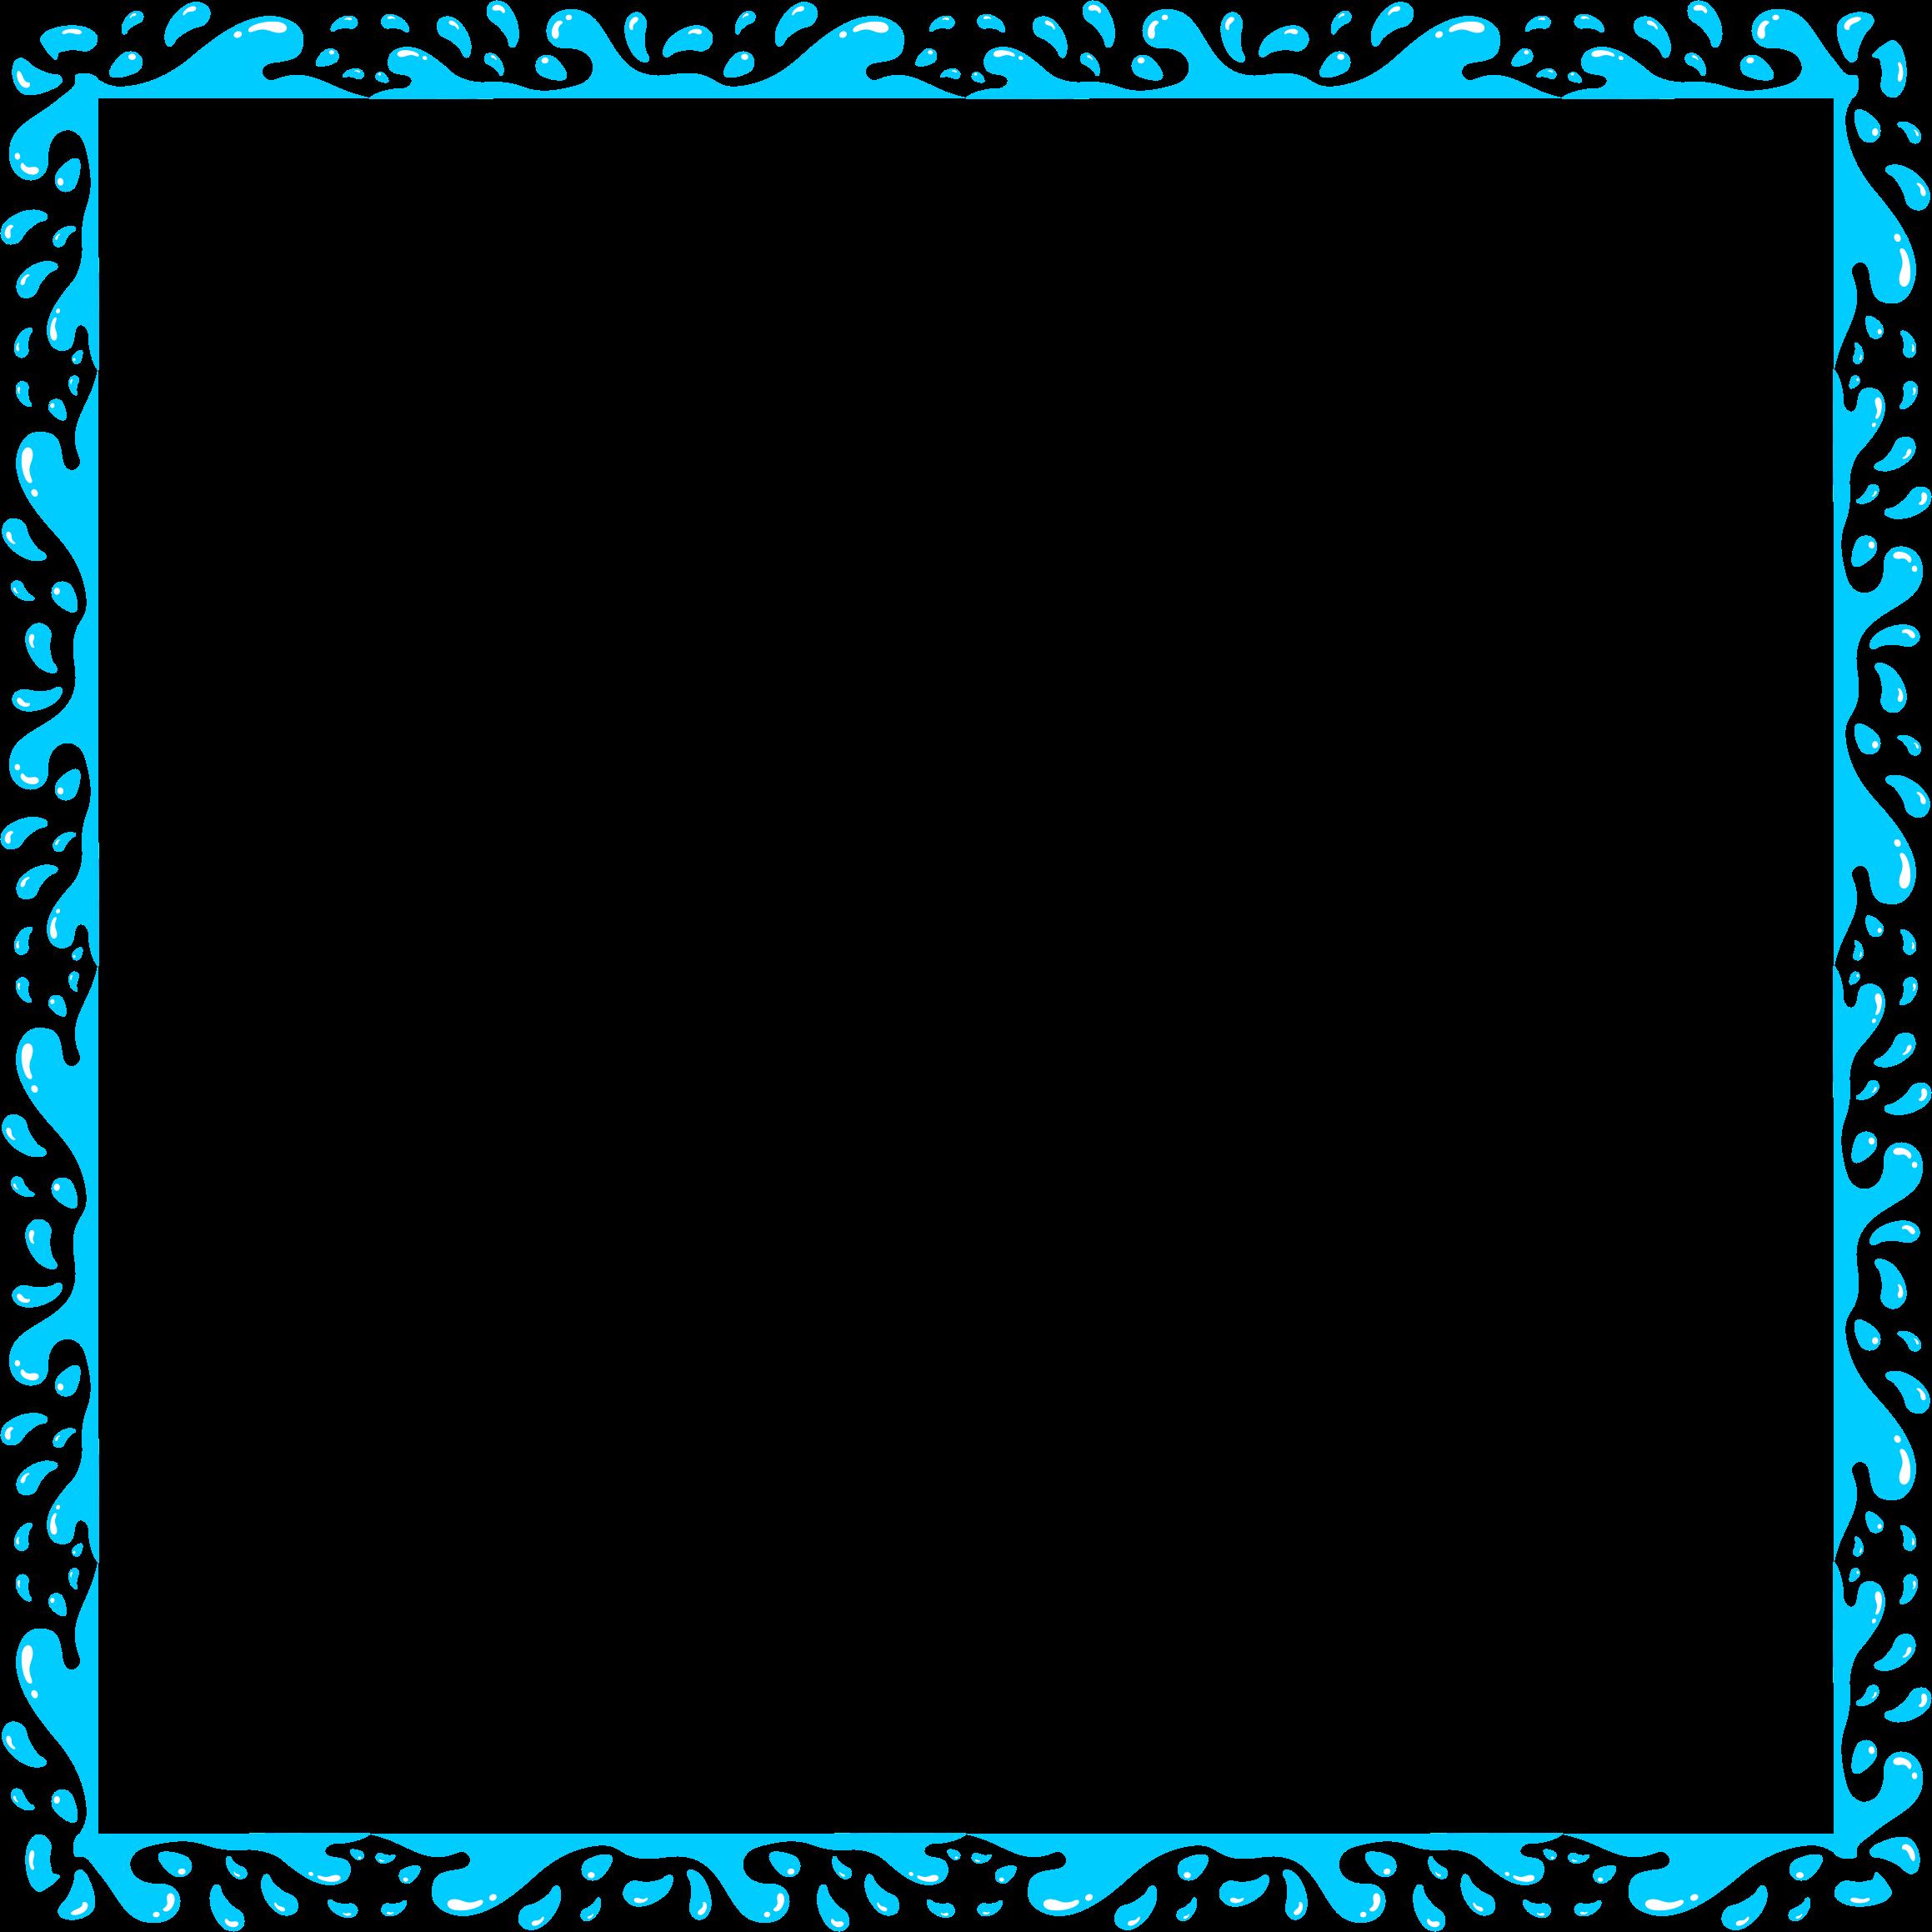 2318x2318 Splash Clipart Border